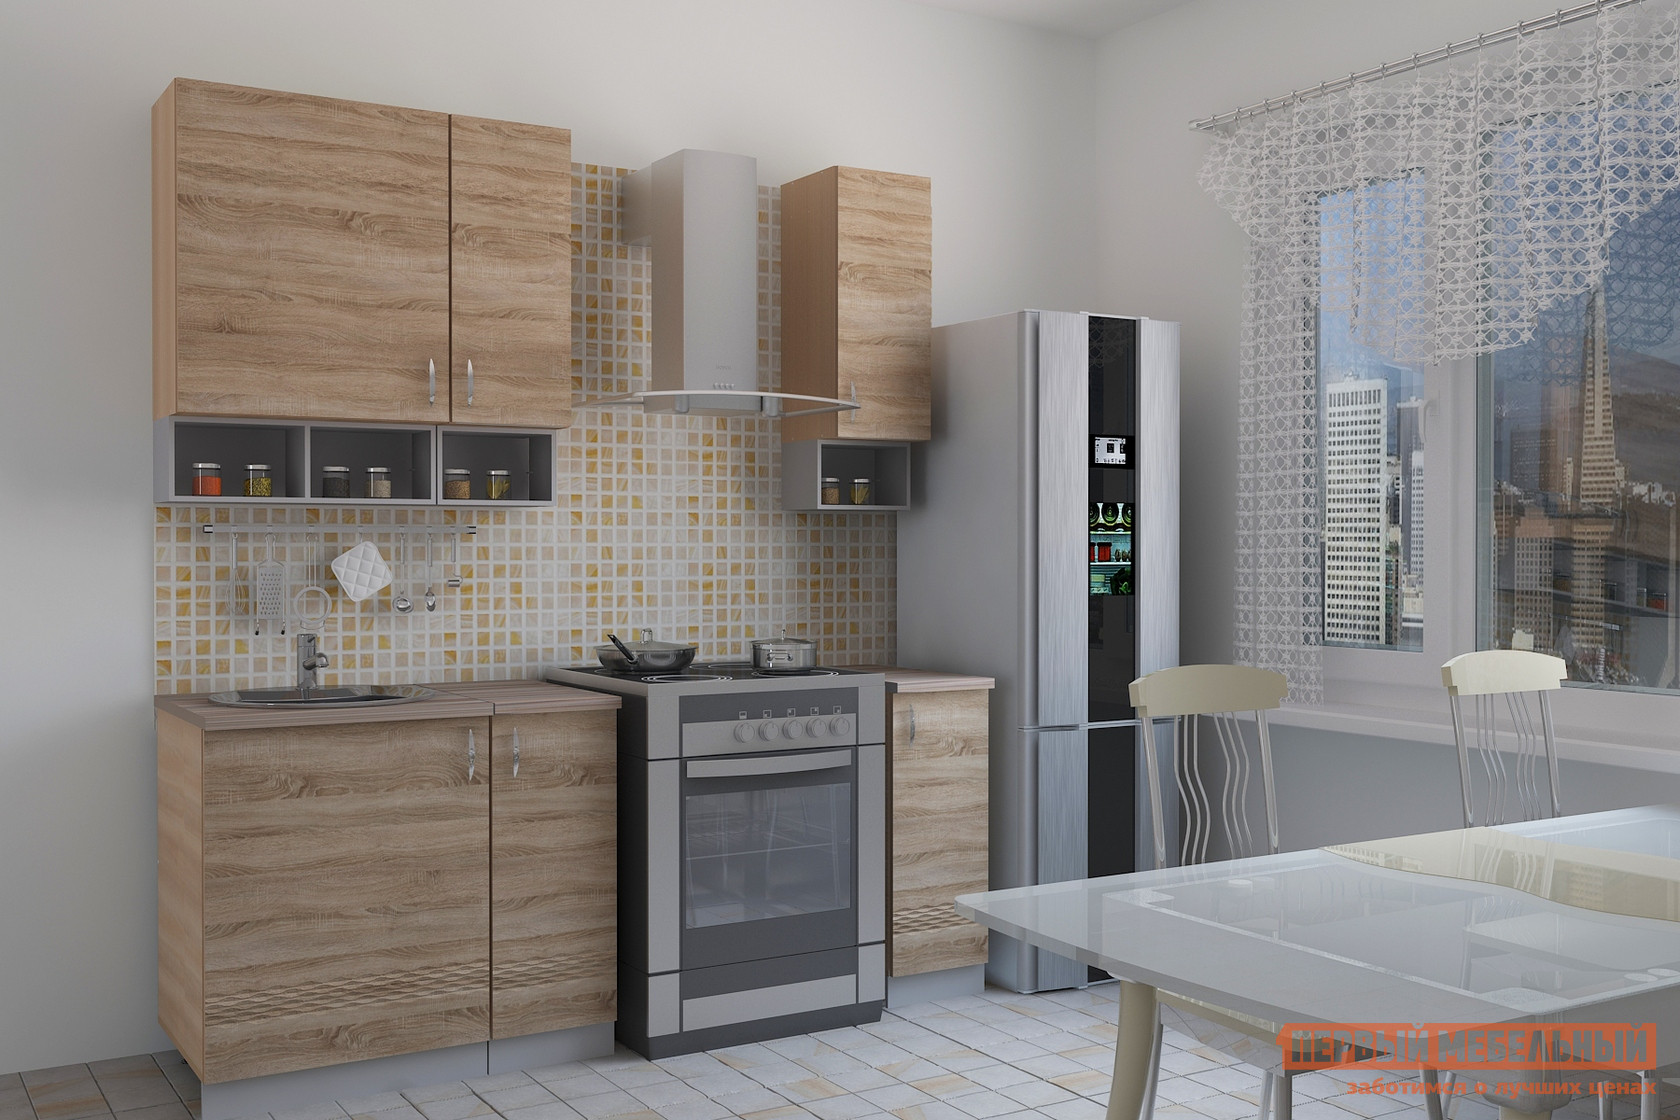 Кухонный гарнитур МО РОСТ Тоскана 1 (prima) кухонный гарнитур трия фэнтези 120 см